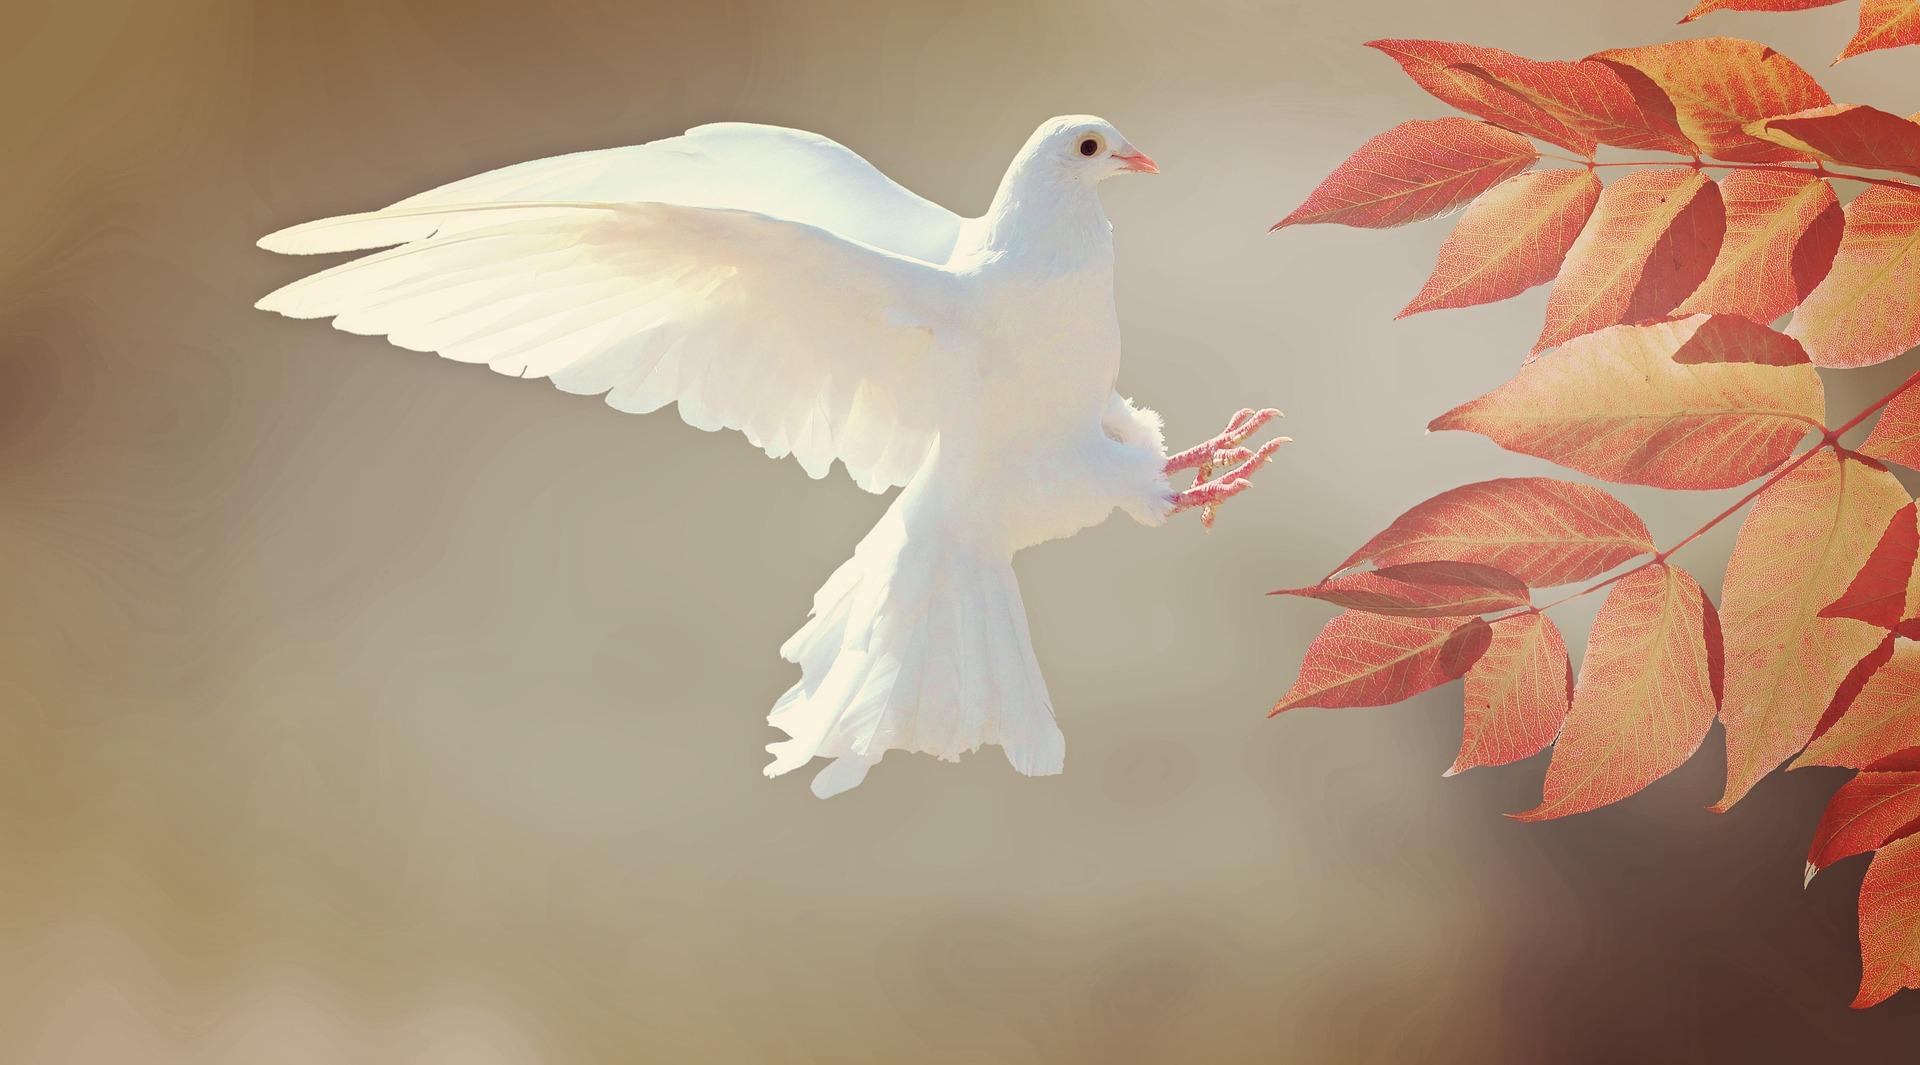 dove-Fatrherheart-France